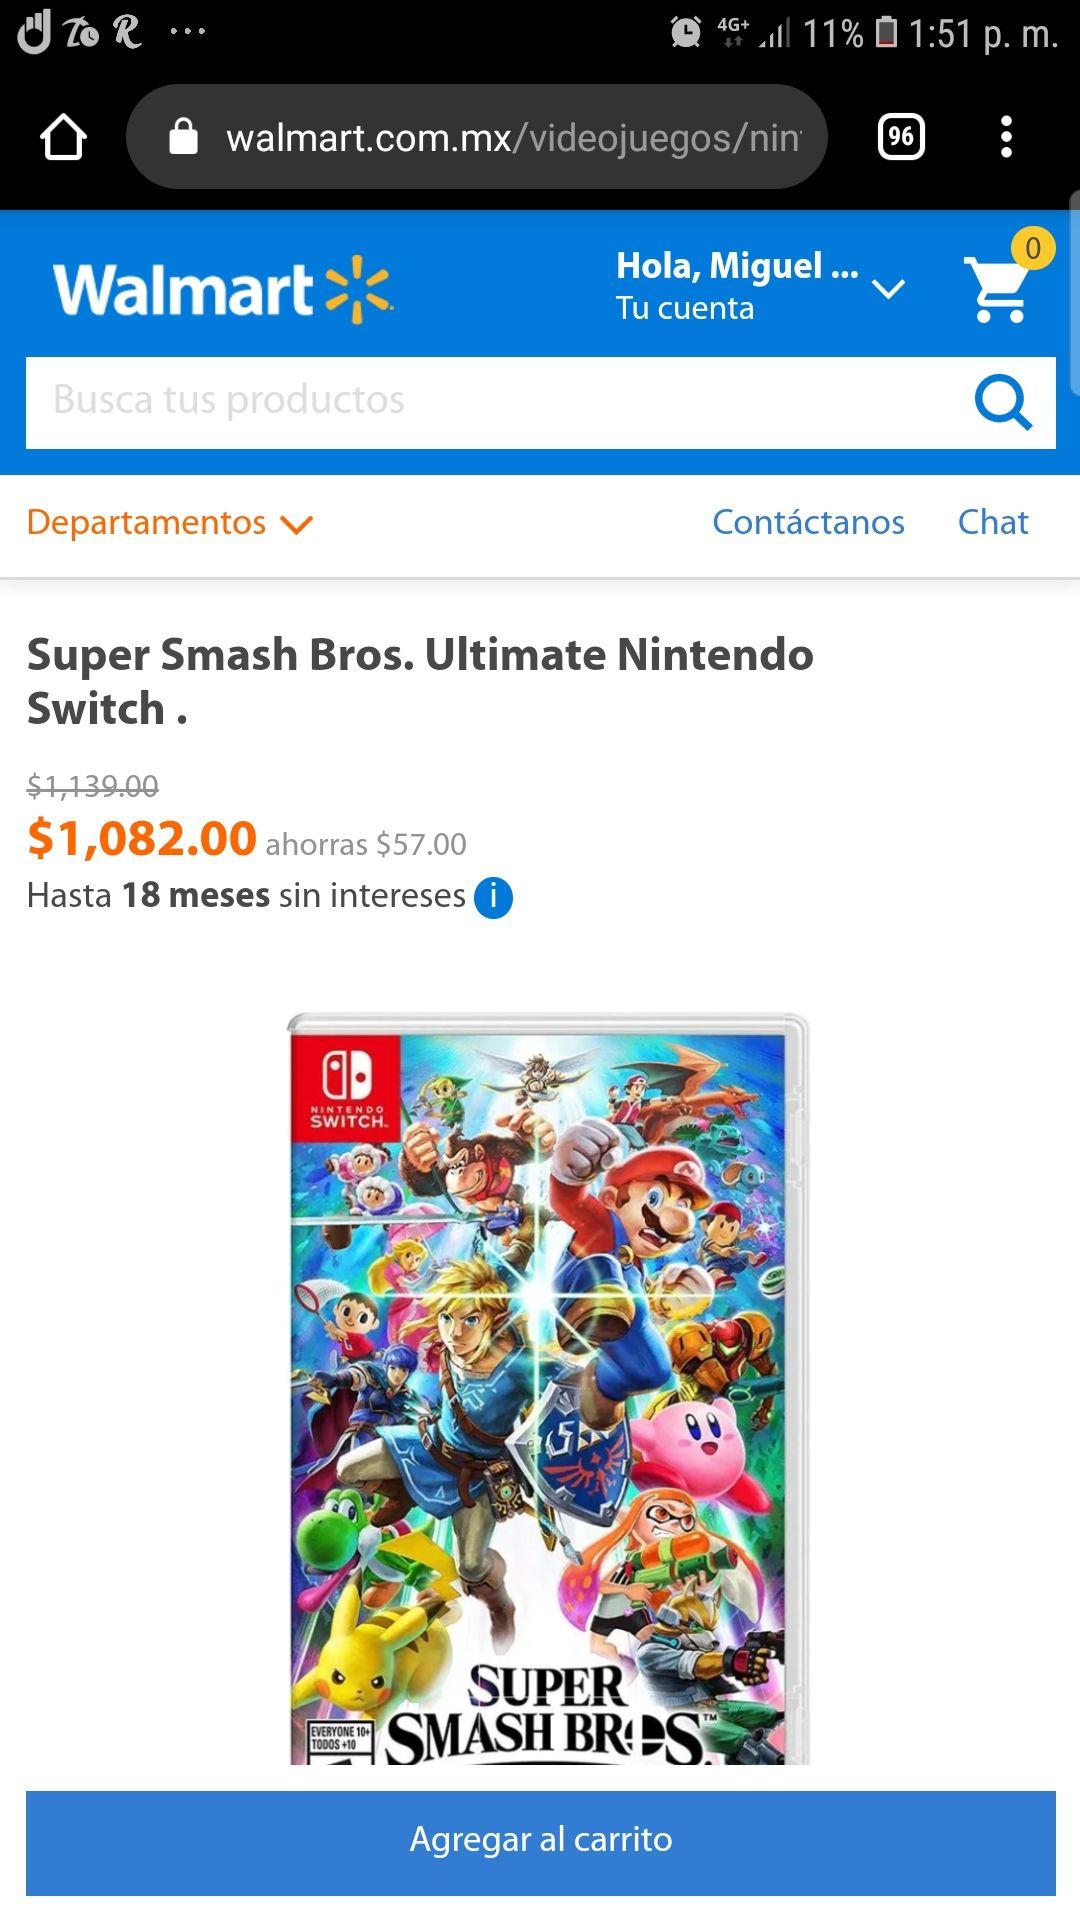 Walmart: Super Smash Bros. Ultimate Nintendo Switch